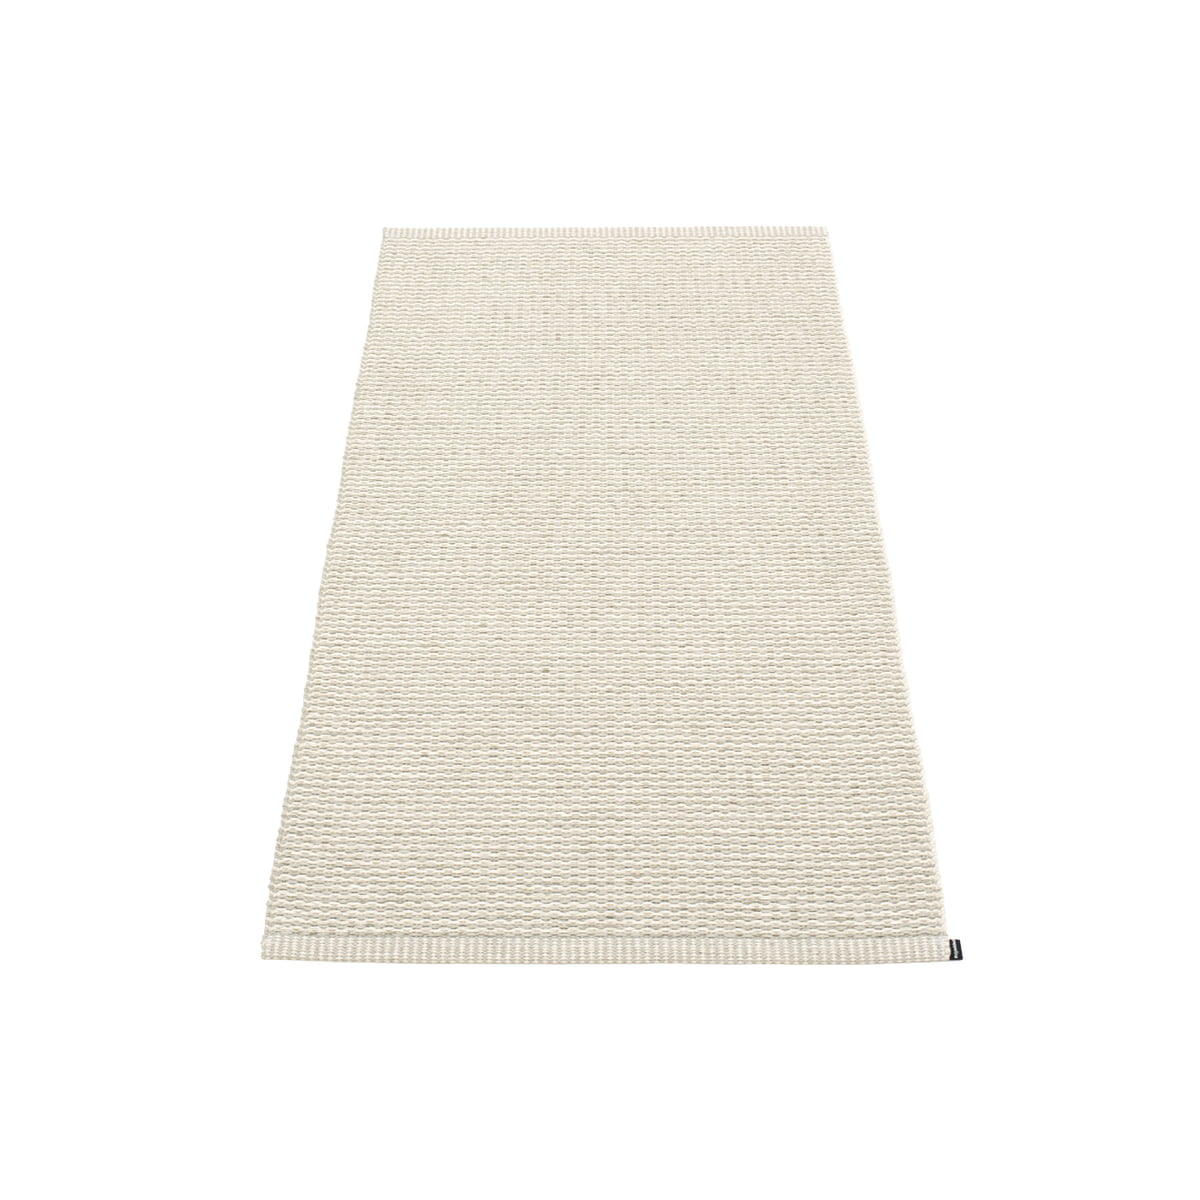 Pappelina Mono Teppich 60 X 150 Cm Linen Vanilla